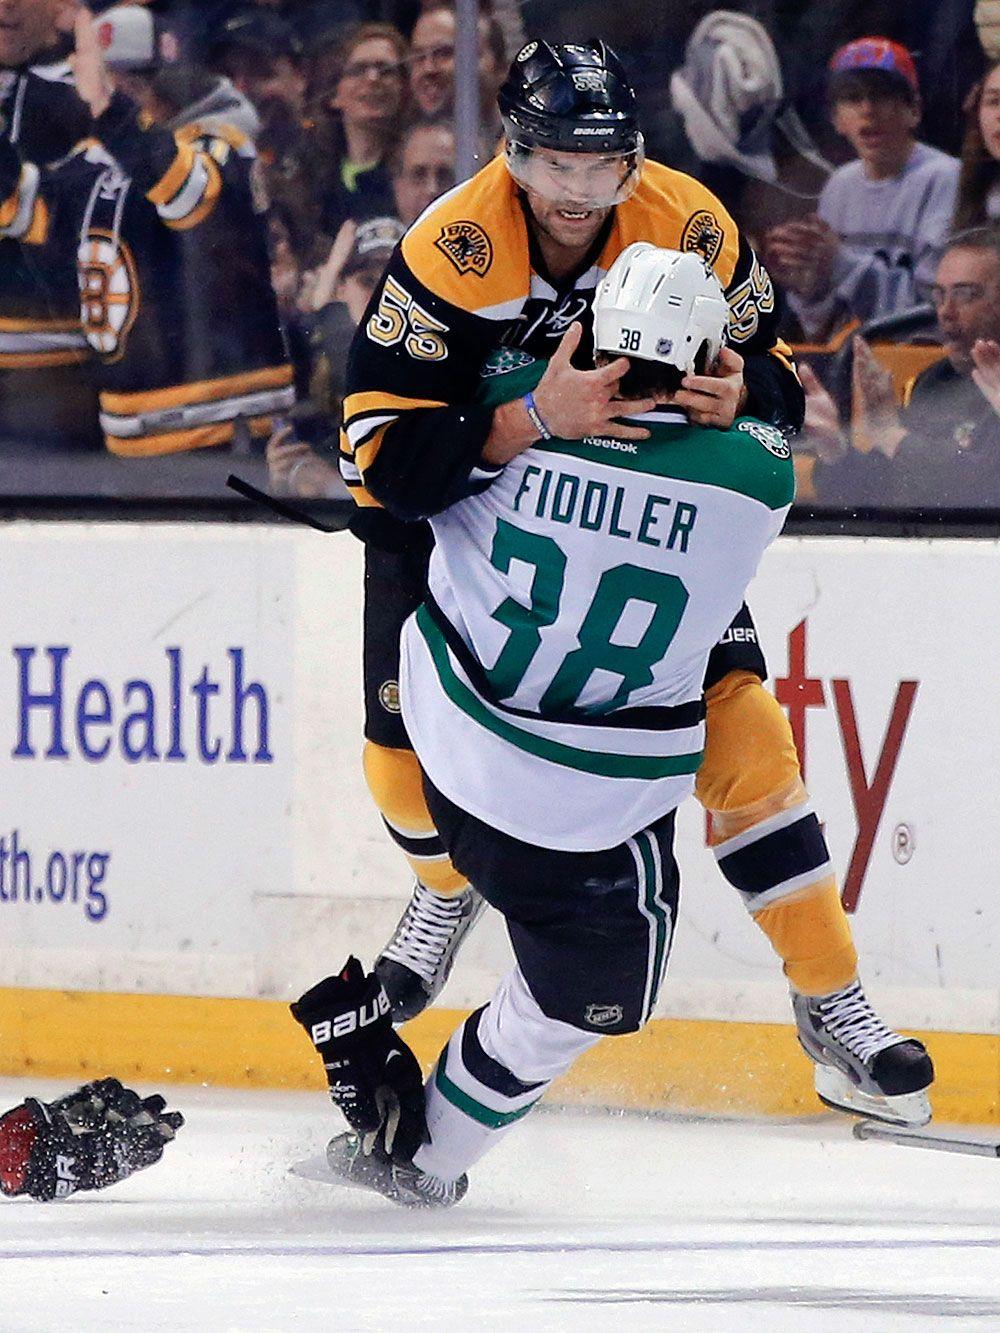 Boston Bruins defenseman Johnny Boychuk (55) fights with